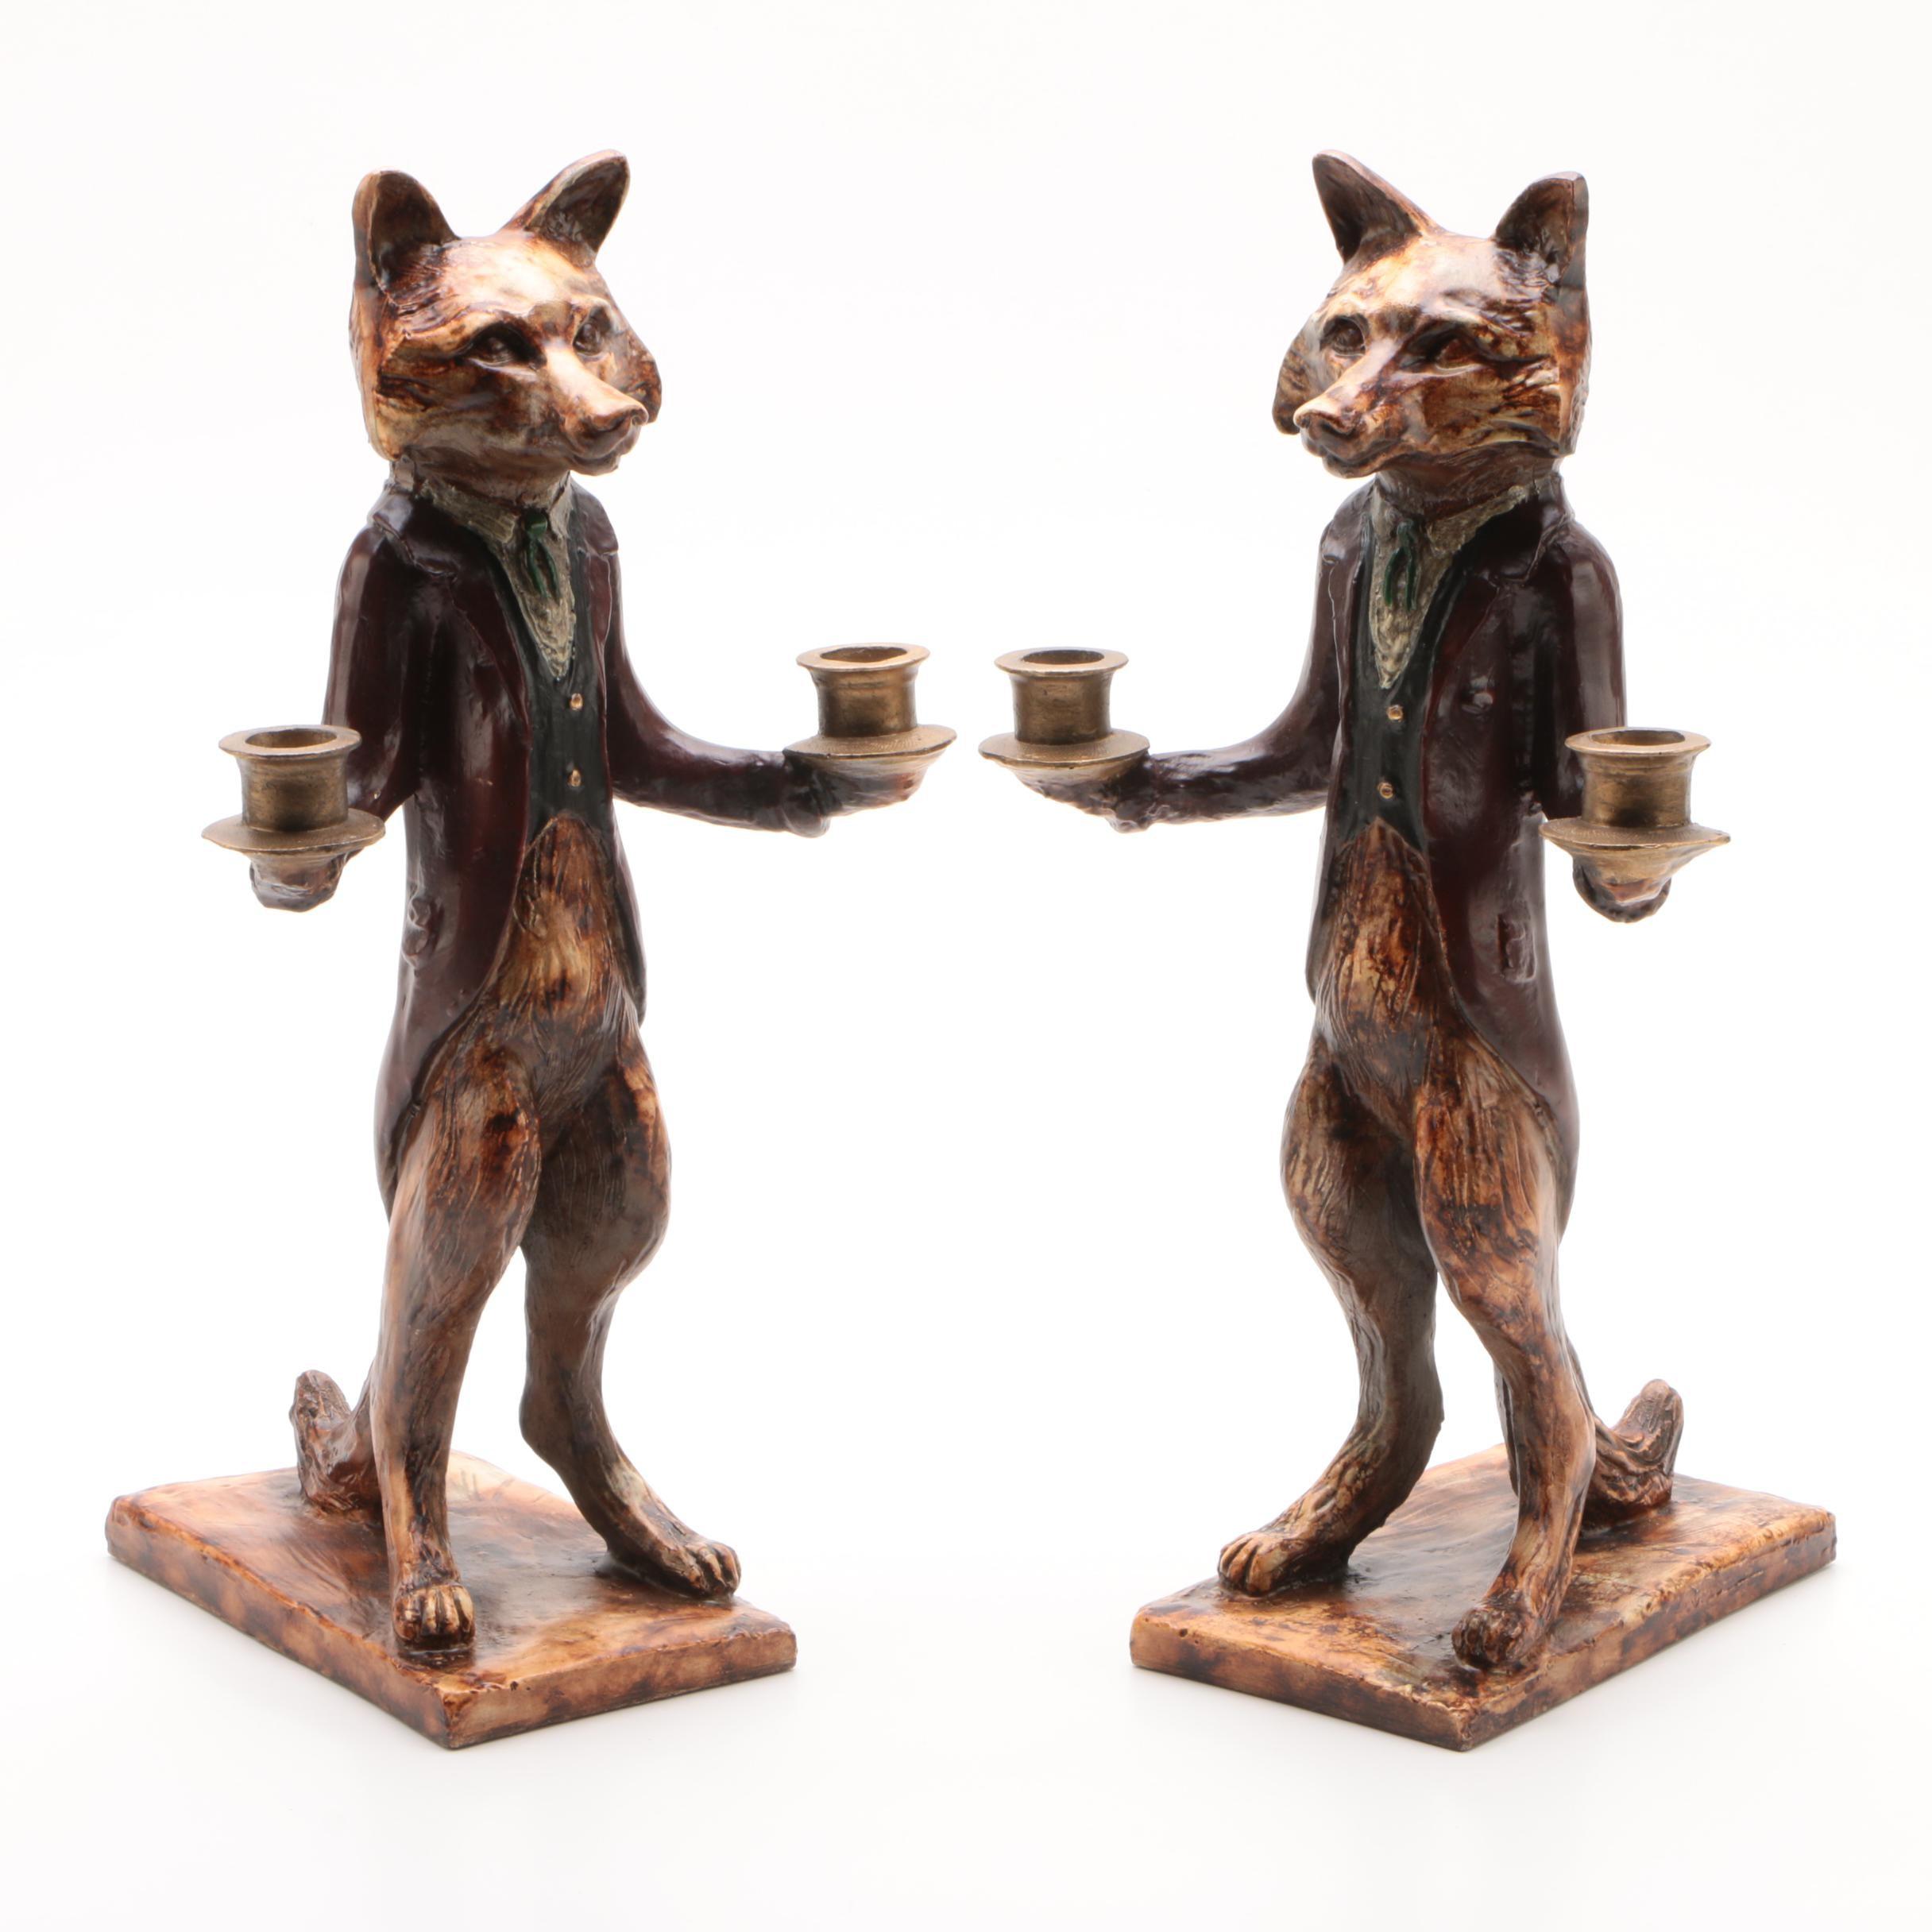 Cast Resin Figurative Anthropomorphic Fox Candleholders